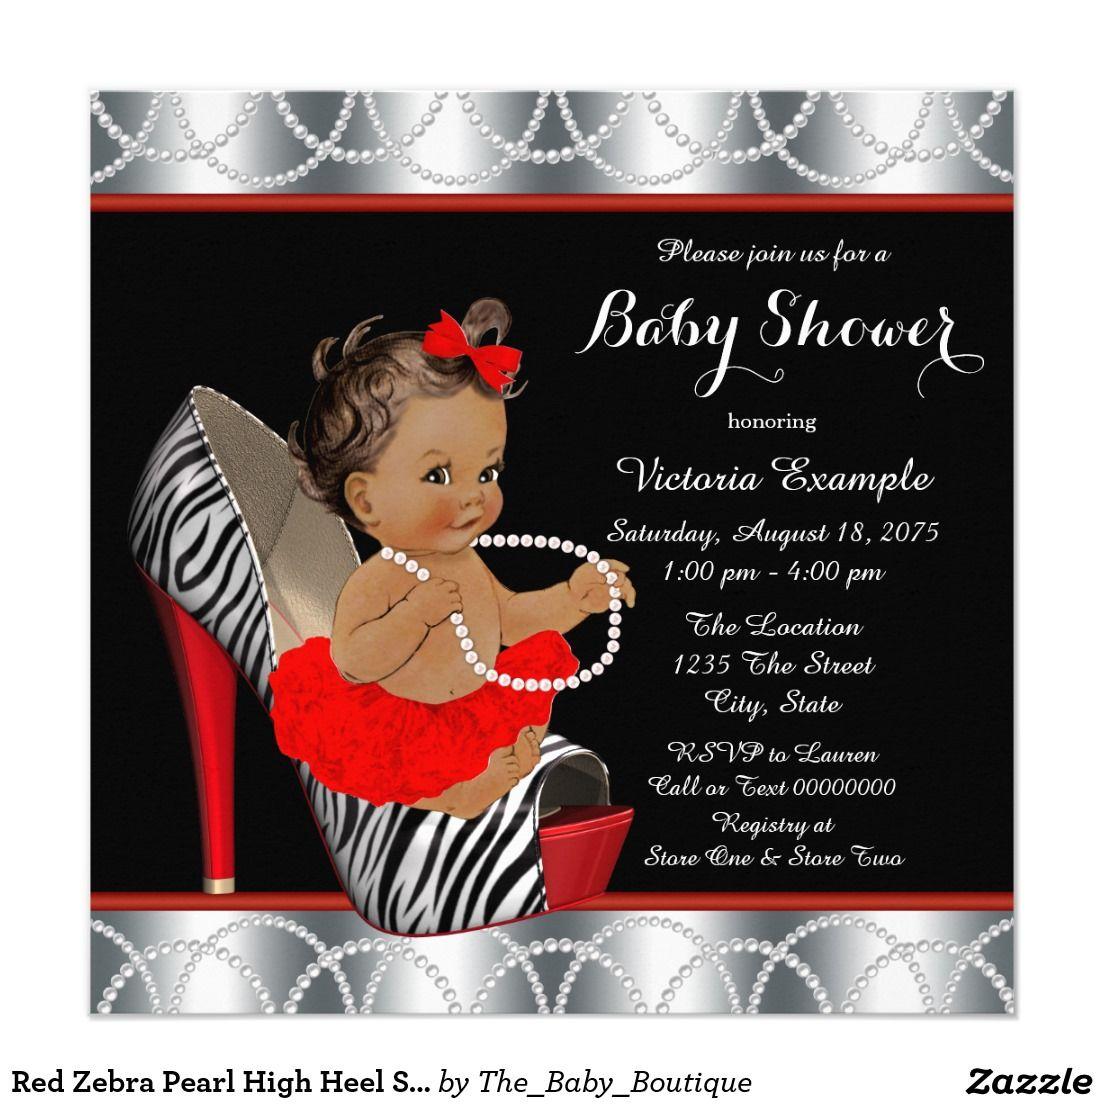 Red Zebra Pearl High Heel Shoe Ethnic Baby Shower Card   Shower ...